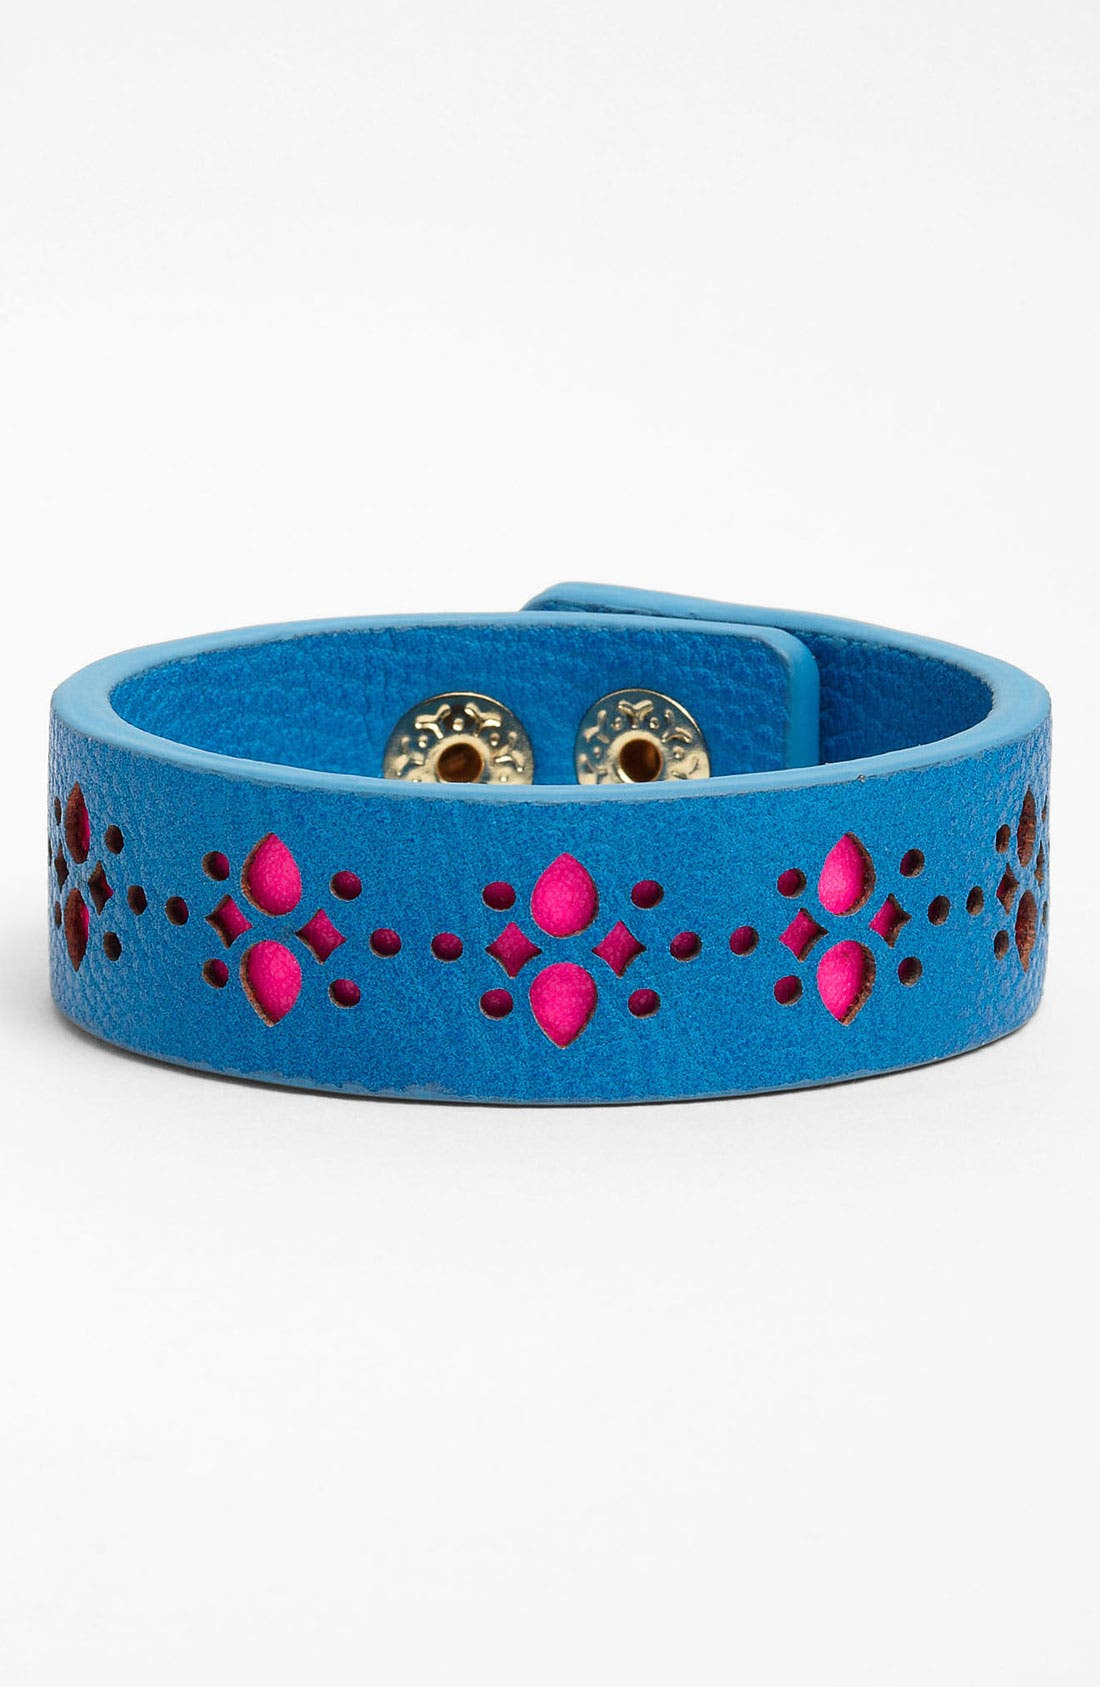 Main Image - Jessica Simpson 'Chic Frills' Bracelet